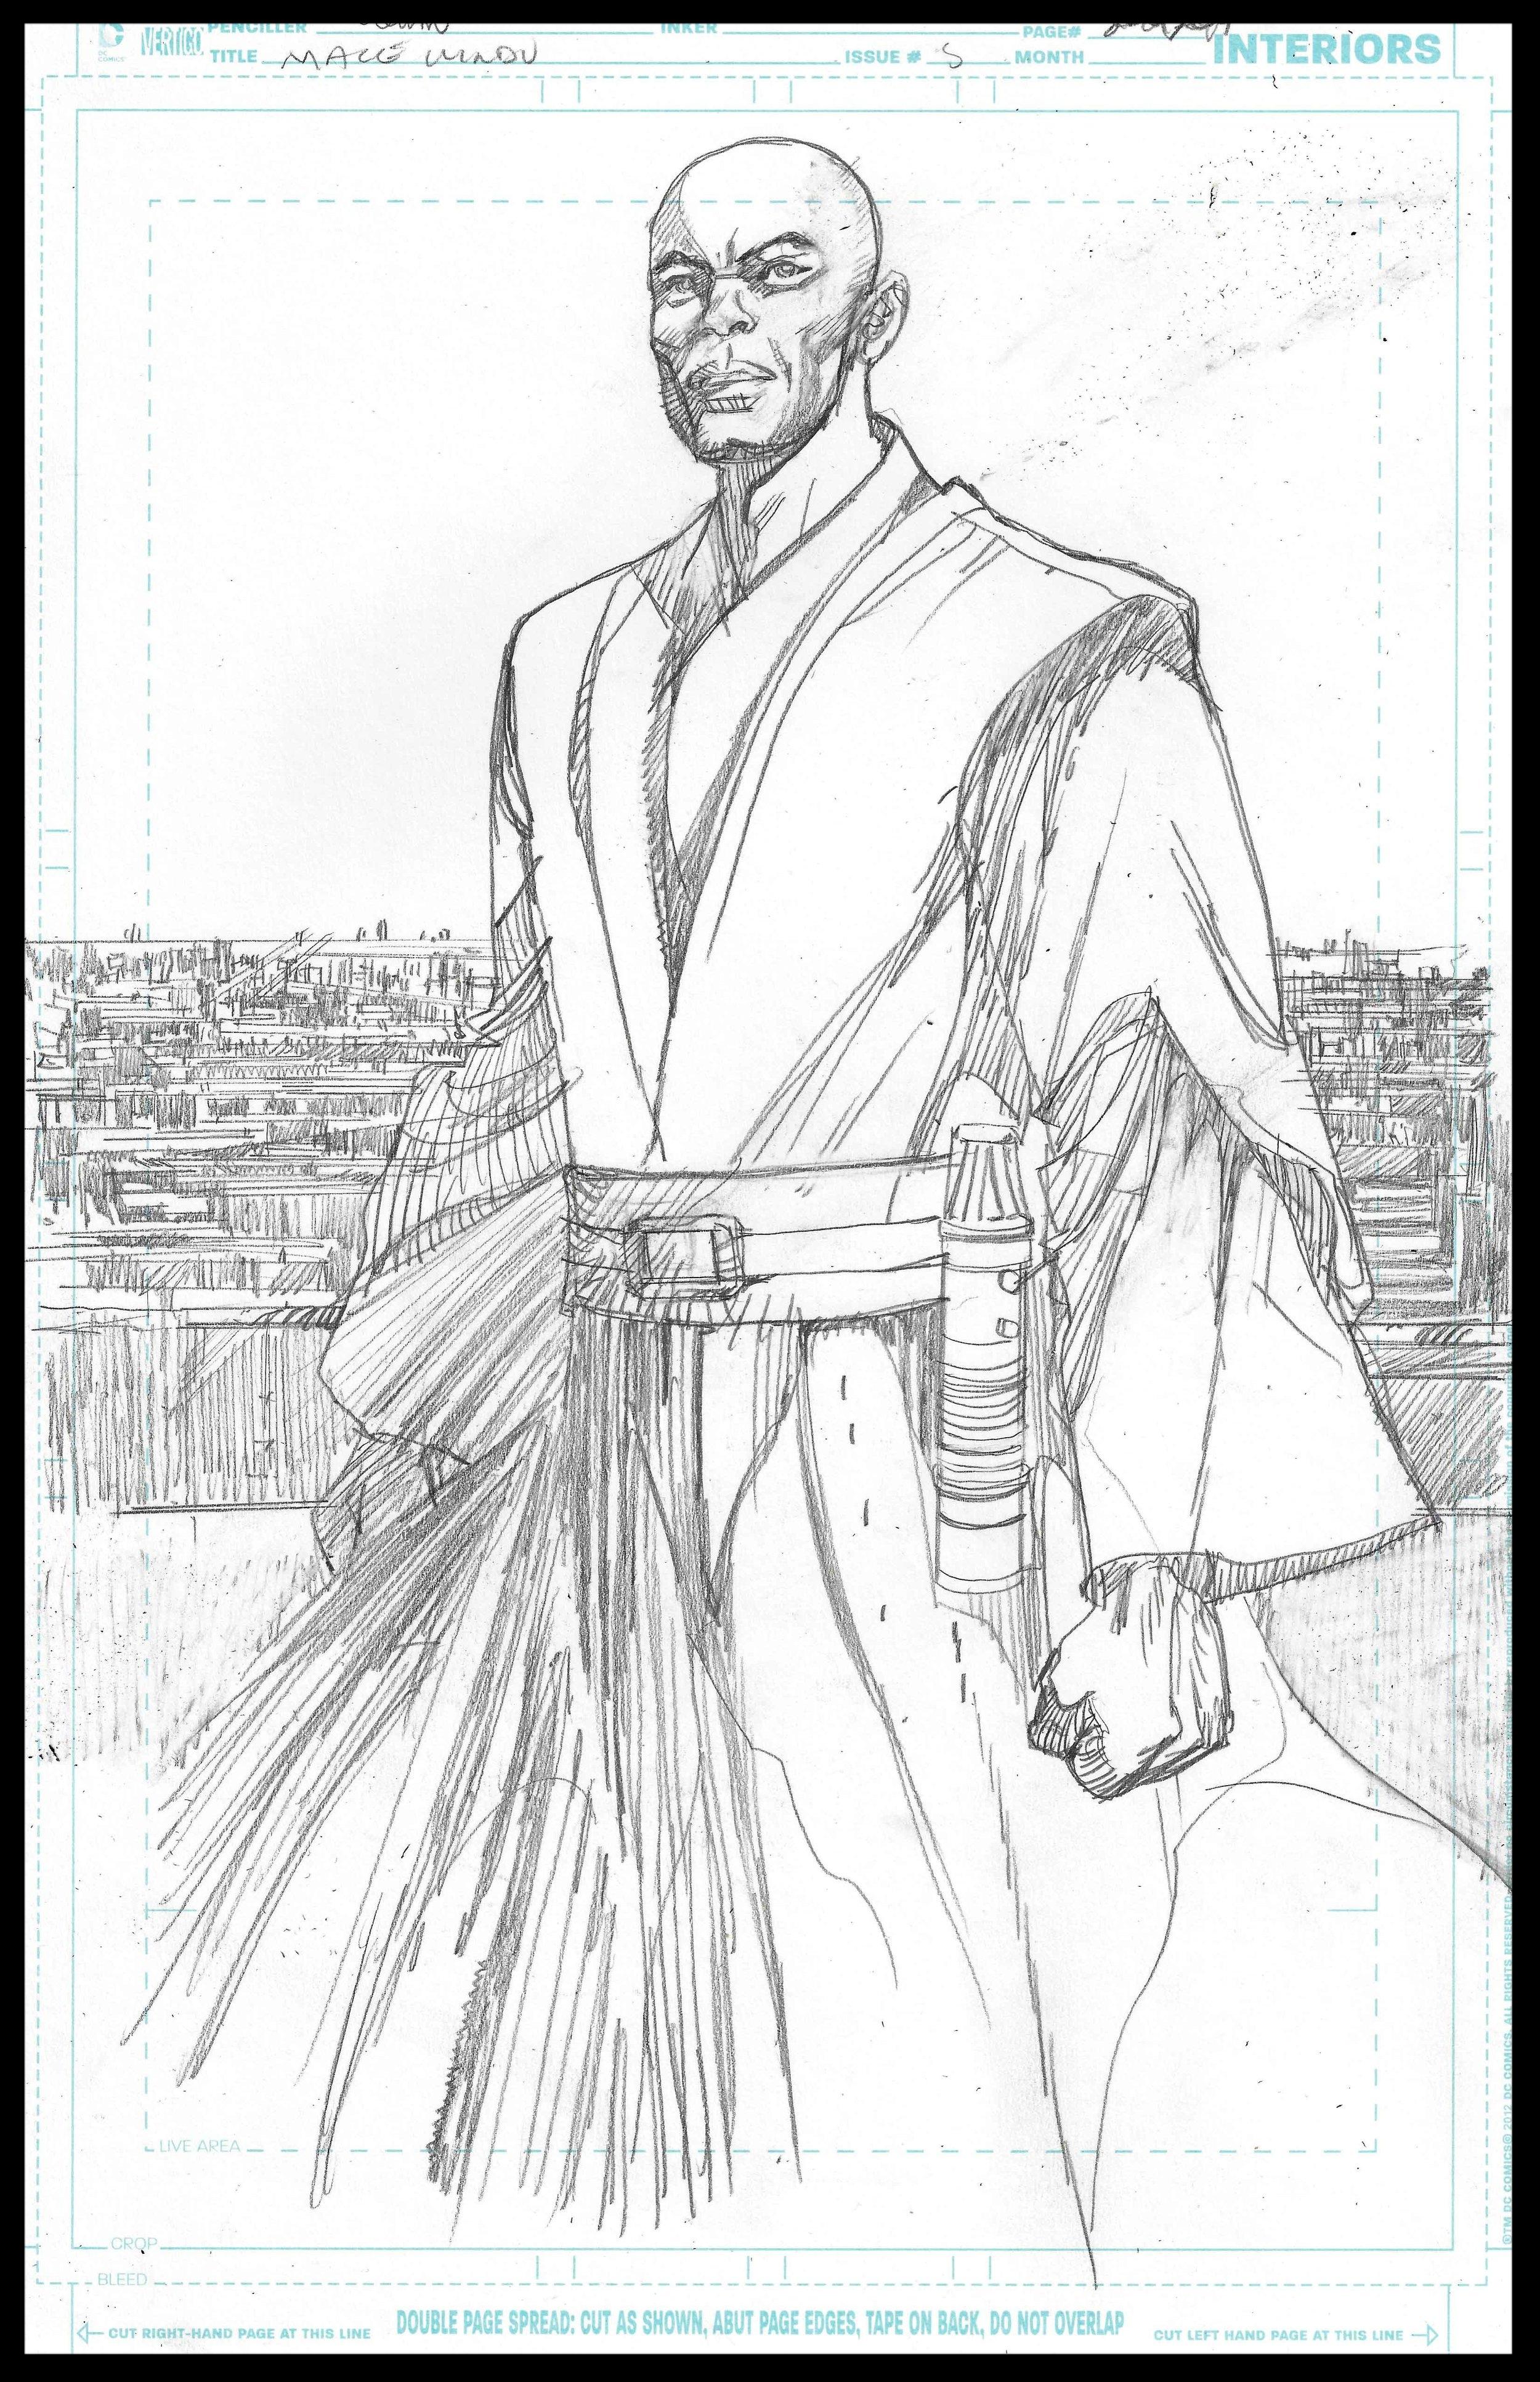 Mace Windu #5 - Page 20 - Pencils